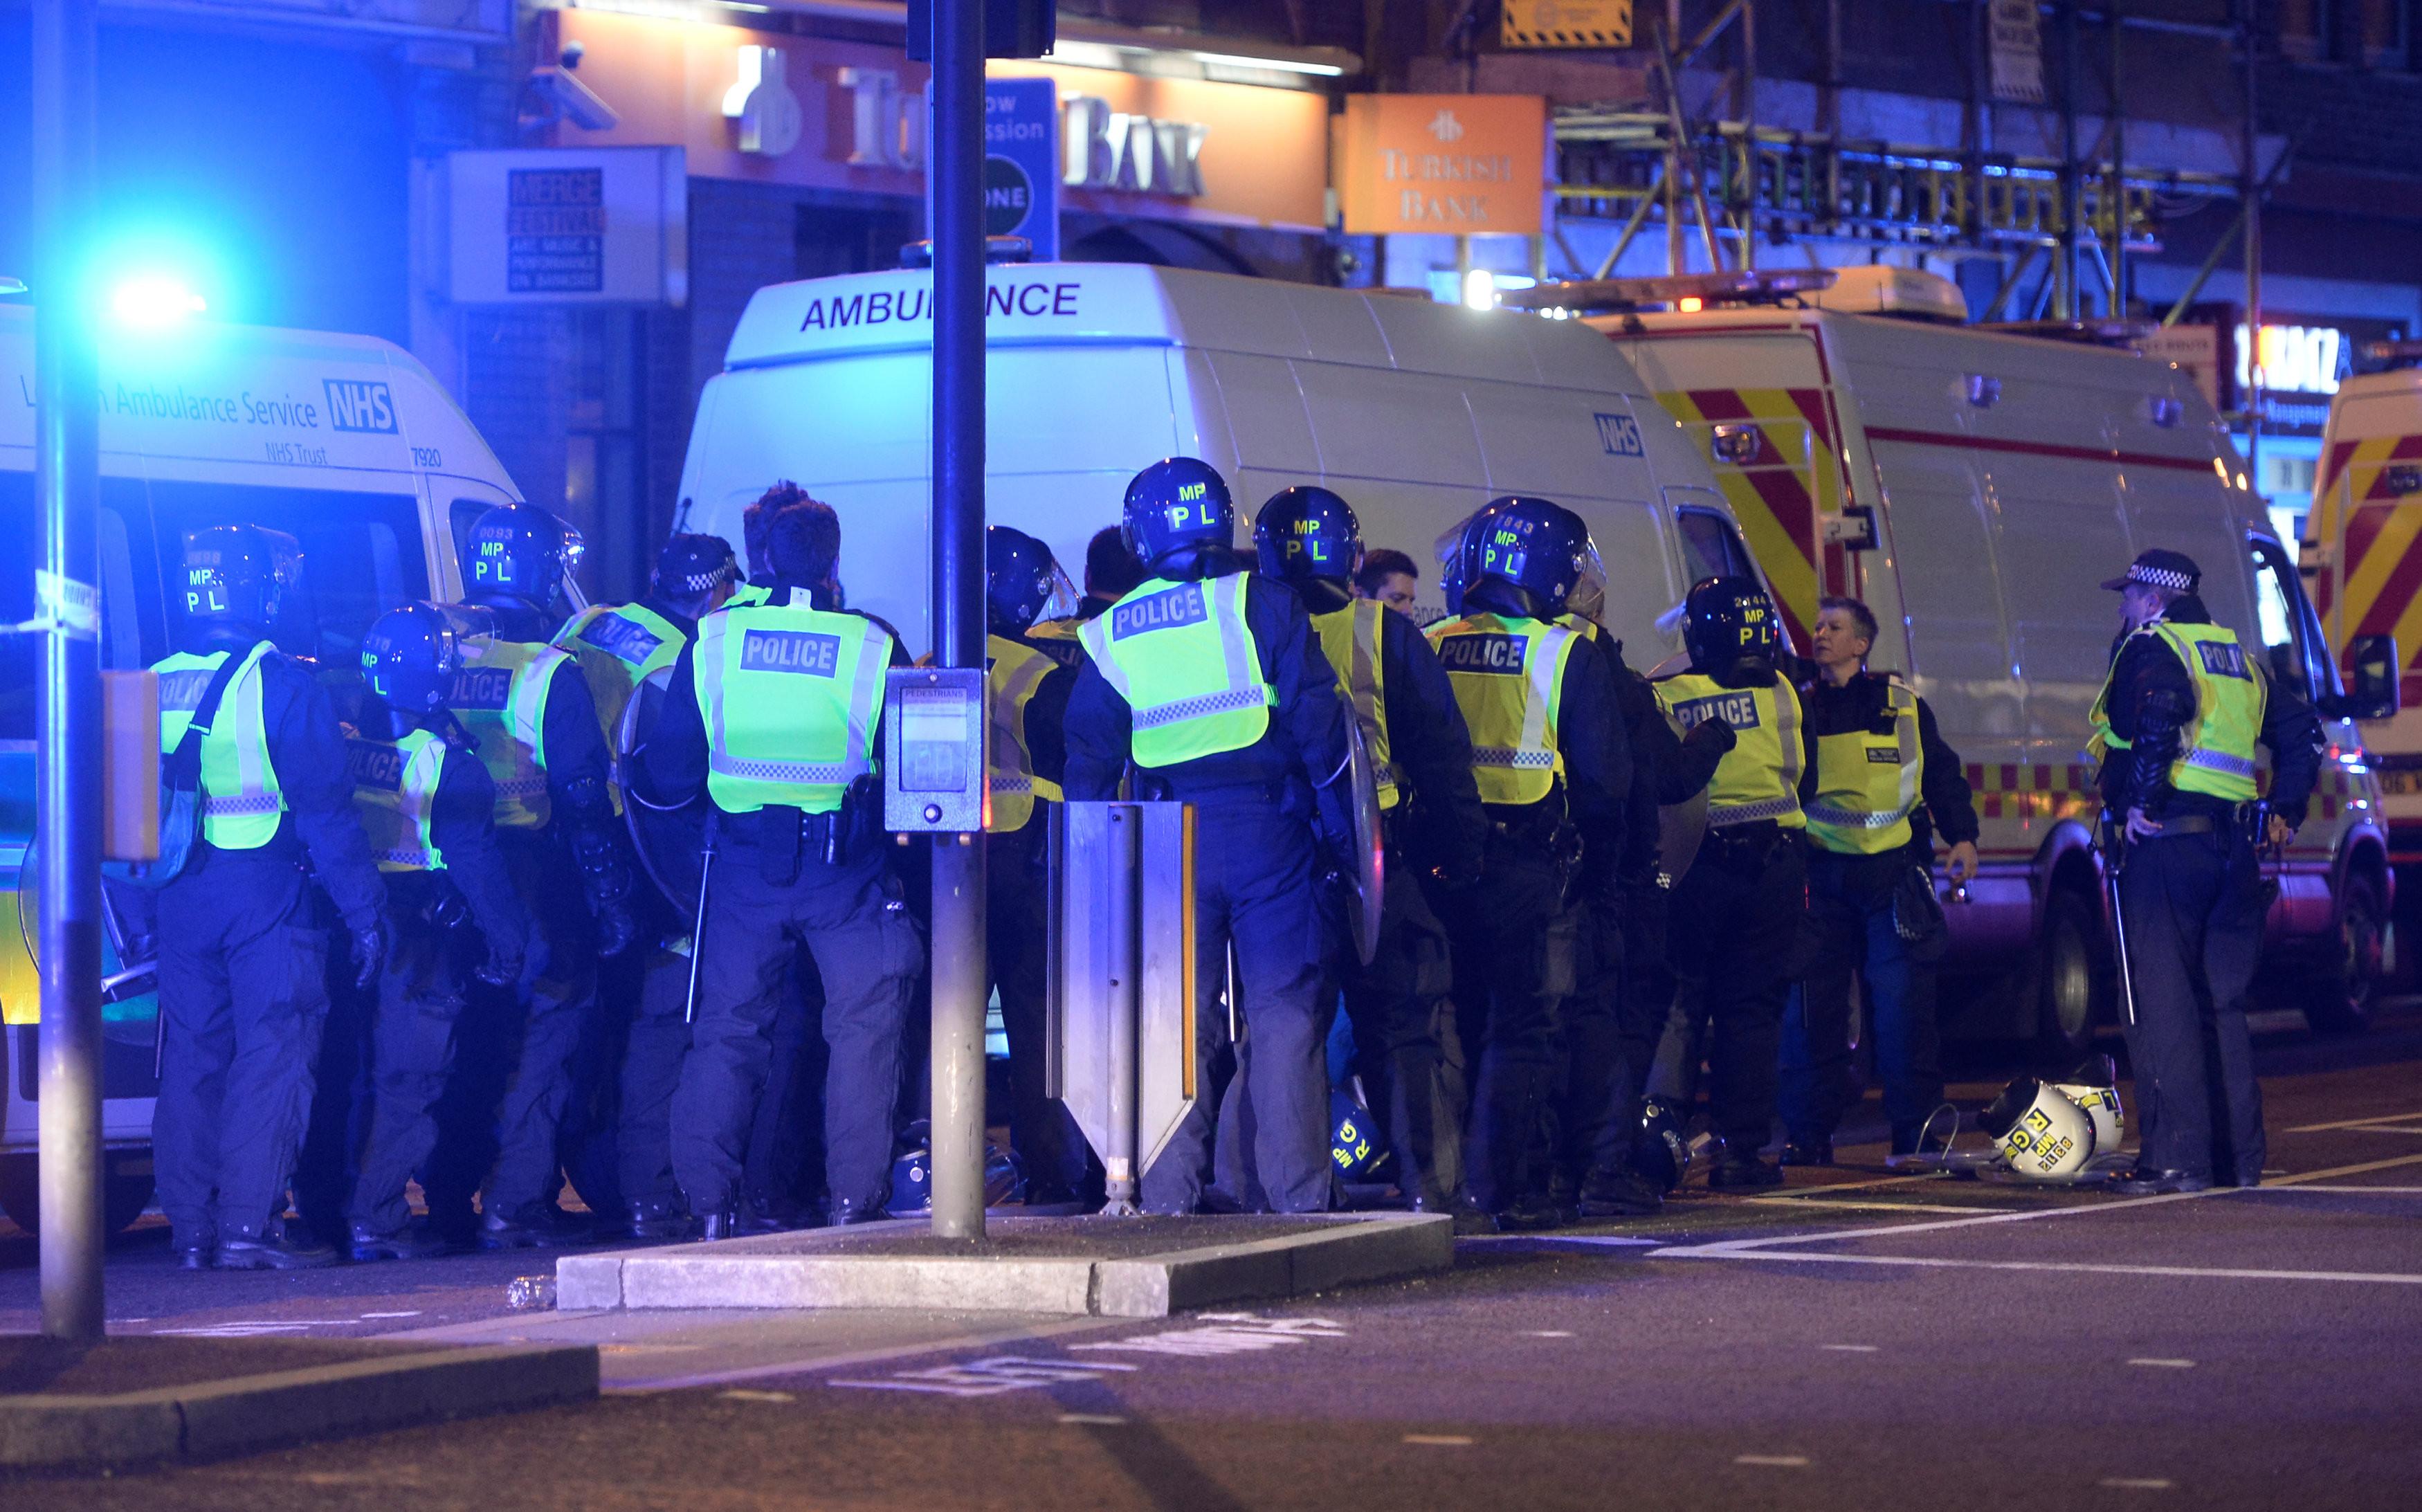 <p>Место ЧП в Лондоне. Фото: &copy;&nbsp;<span>Reuters/Hannah McKay</span></p>